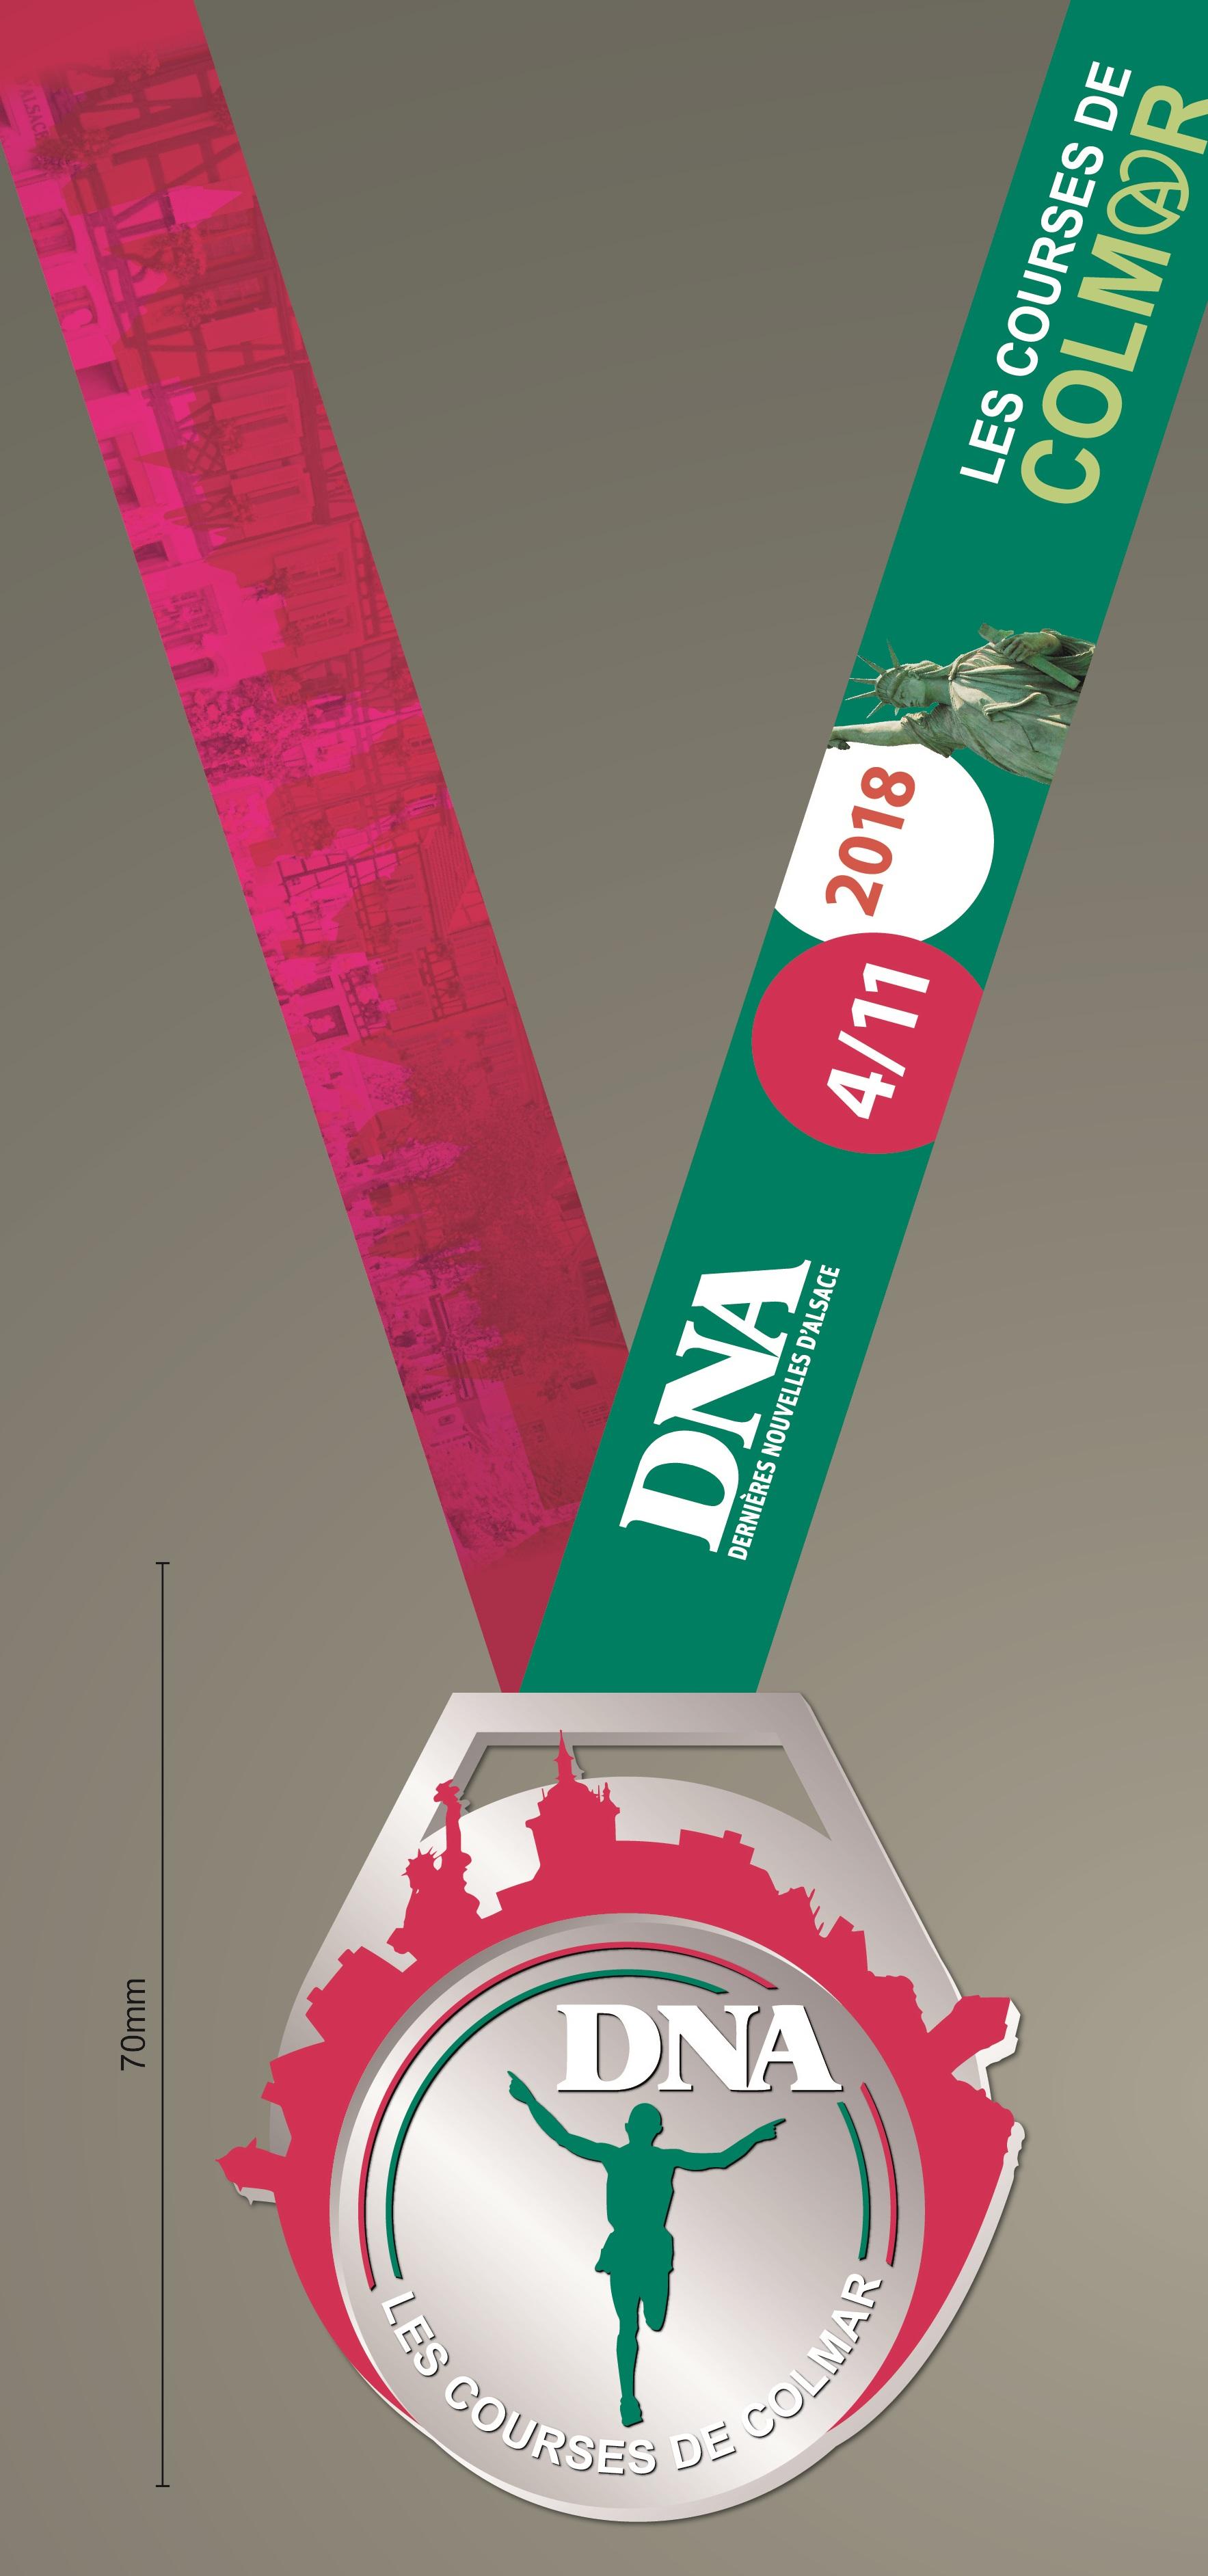 Médailles Course DNA Colmar